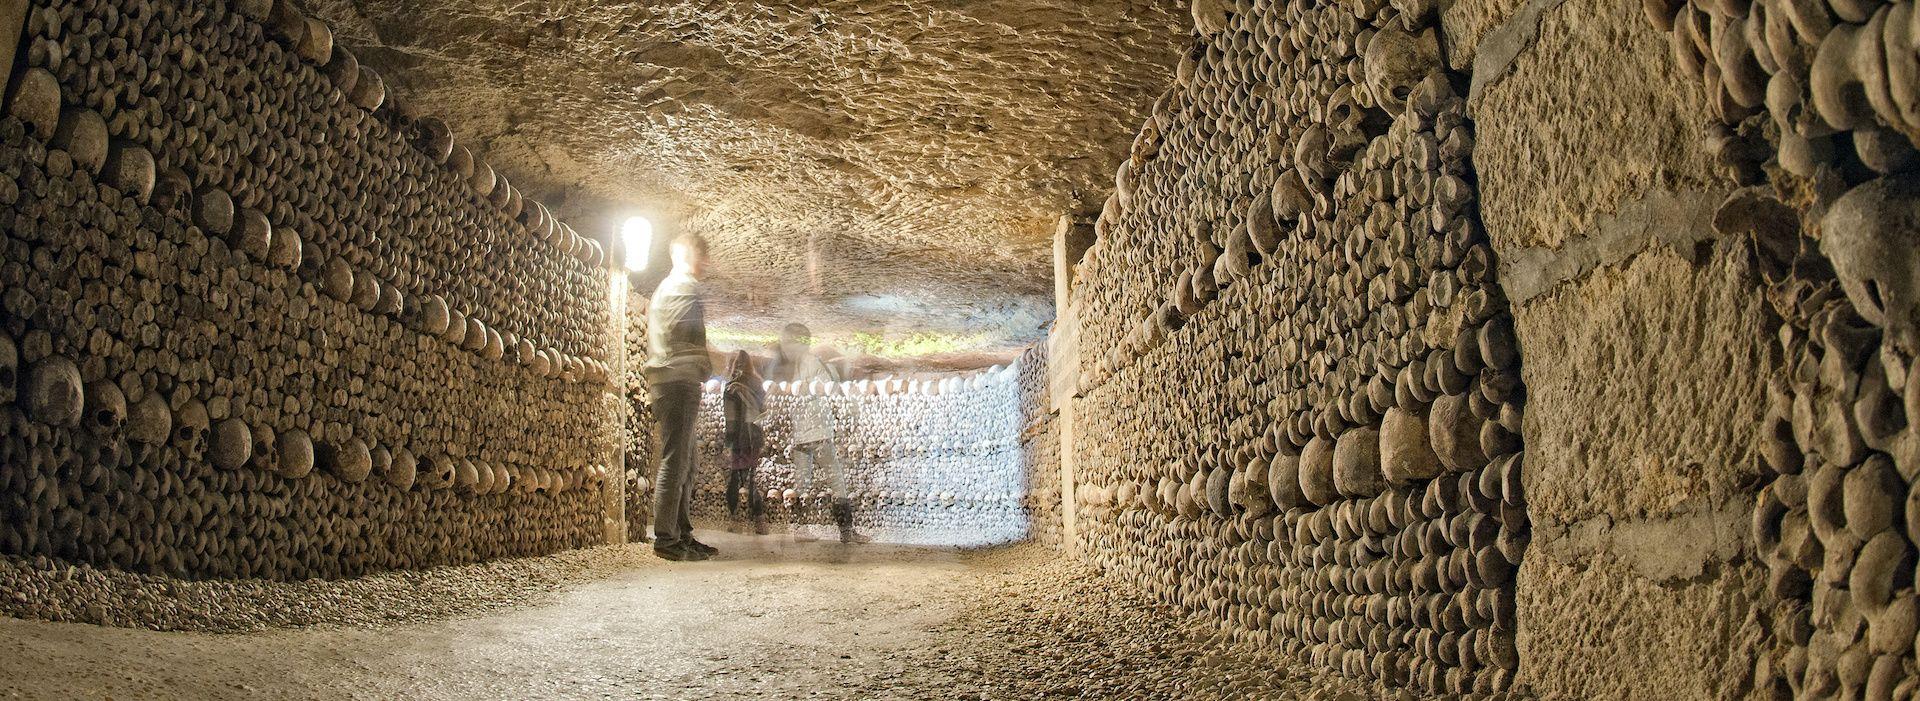 Paris Catacombs Attraction